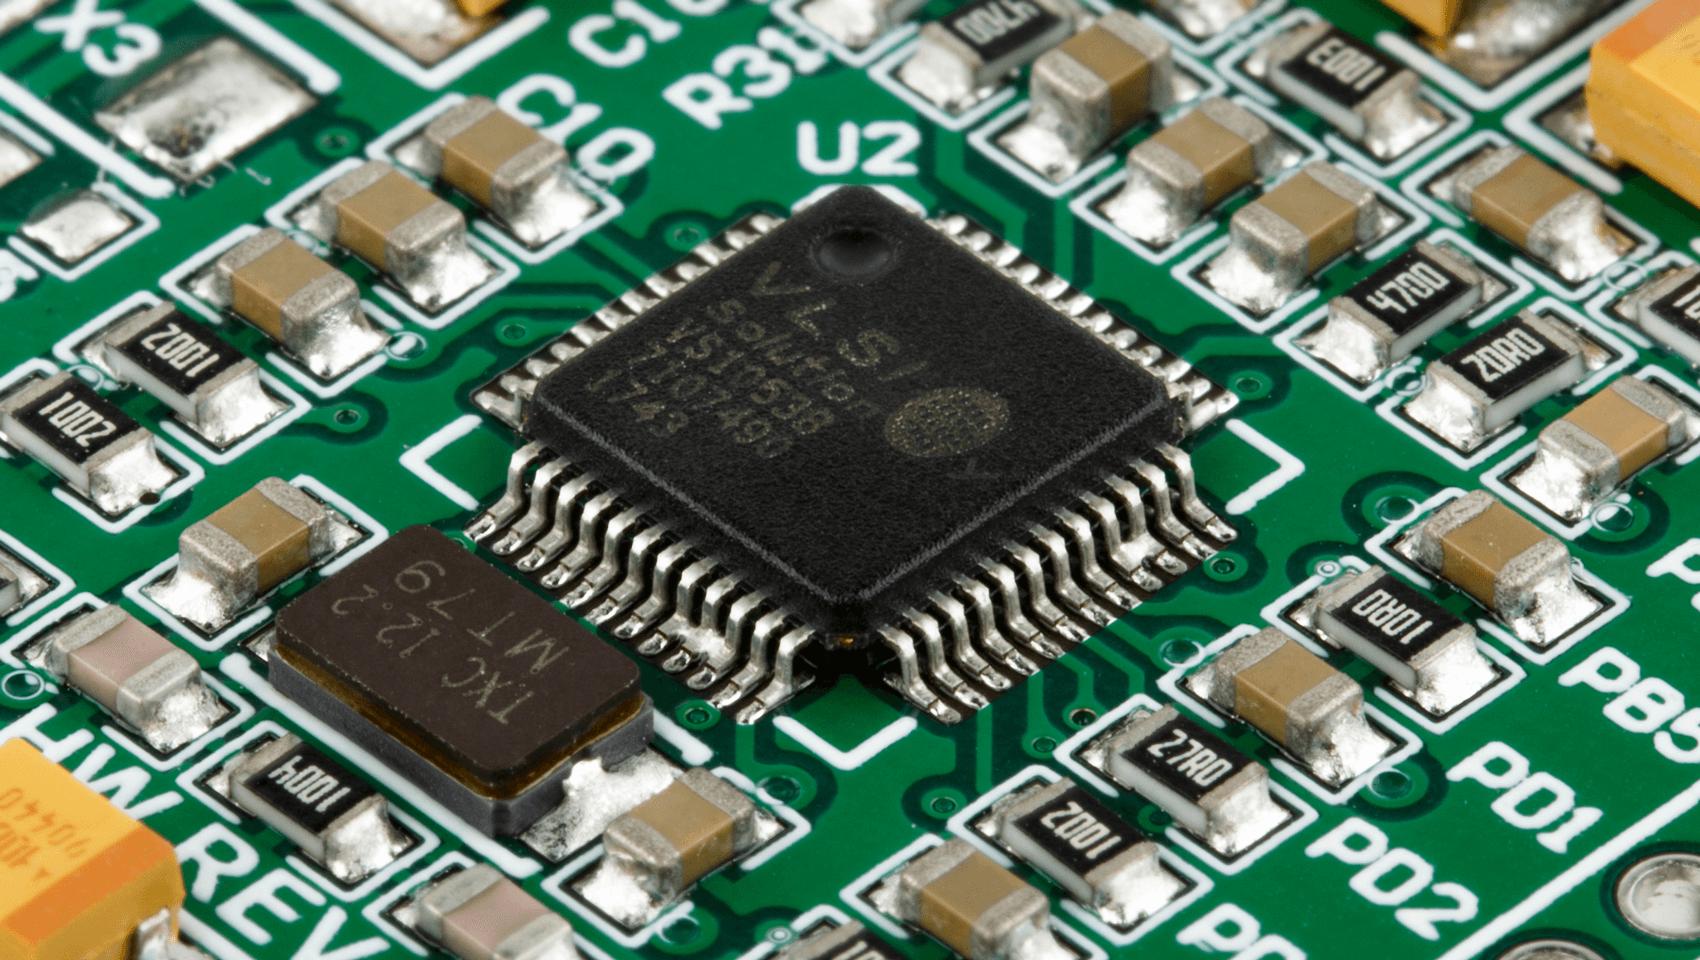 mikromedia for STM32 M3 - ARM Cortex-M3 Development Board